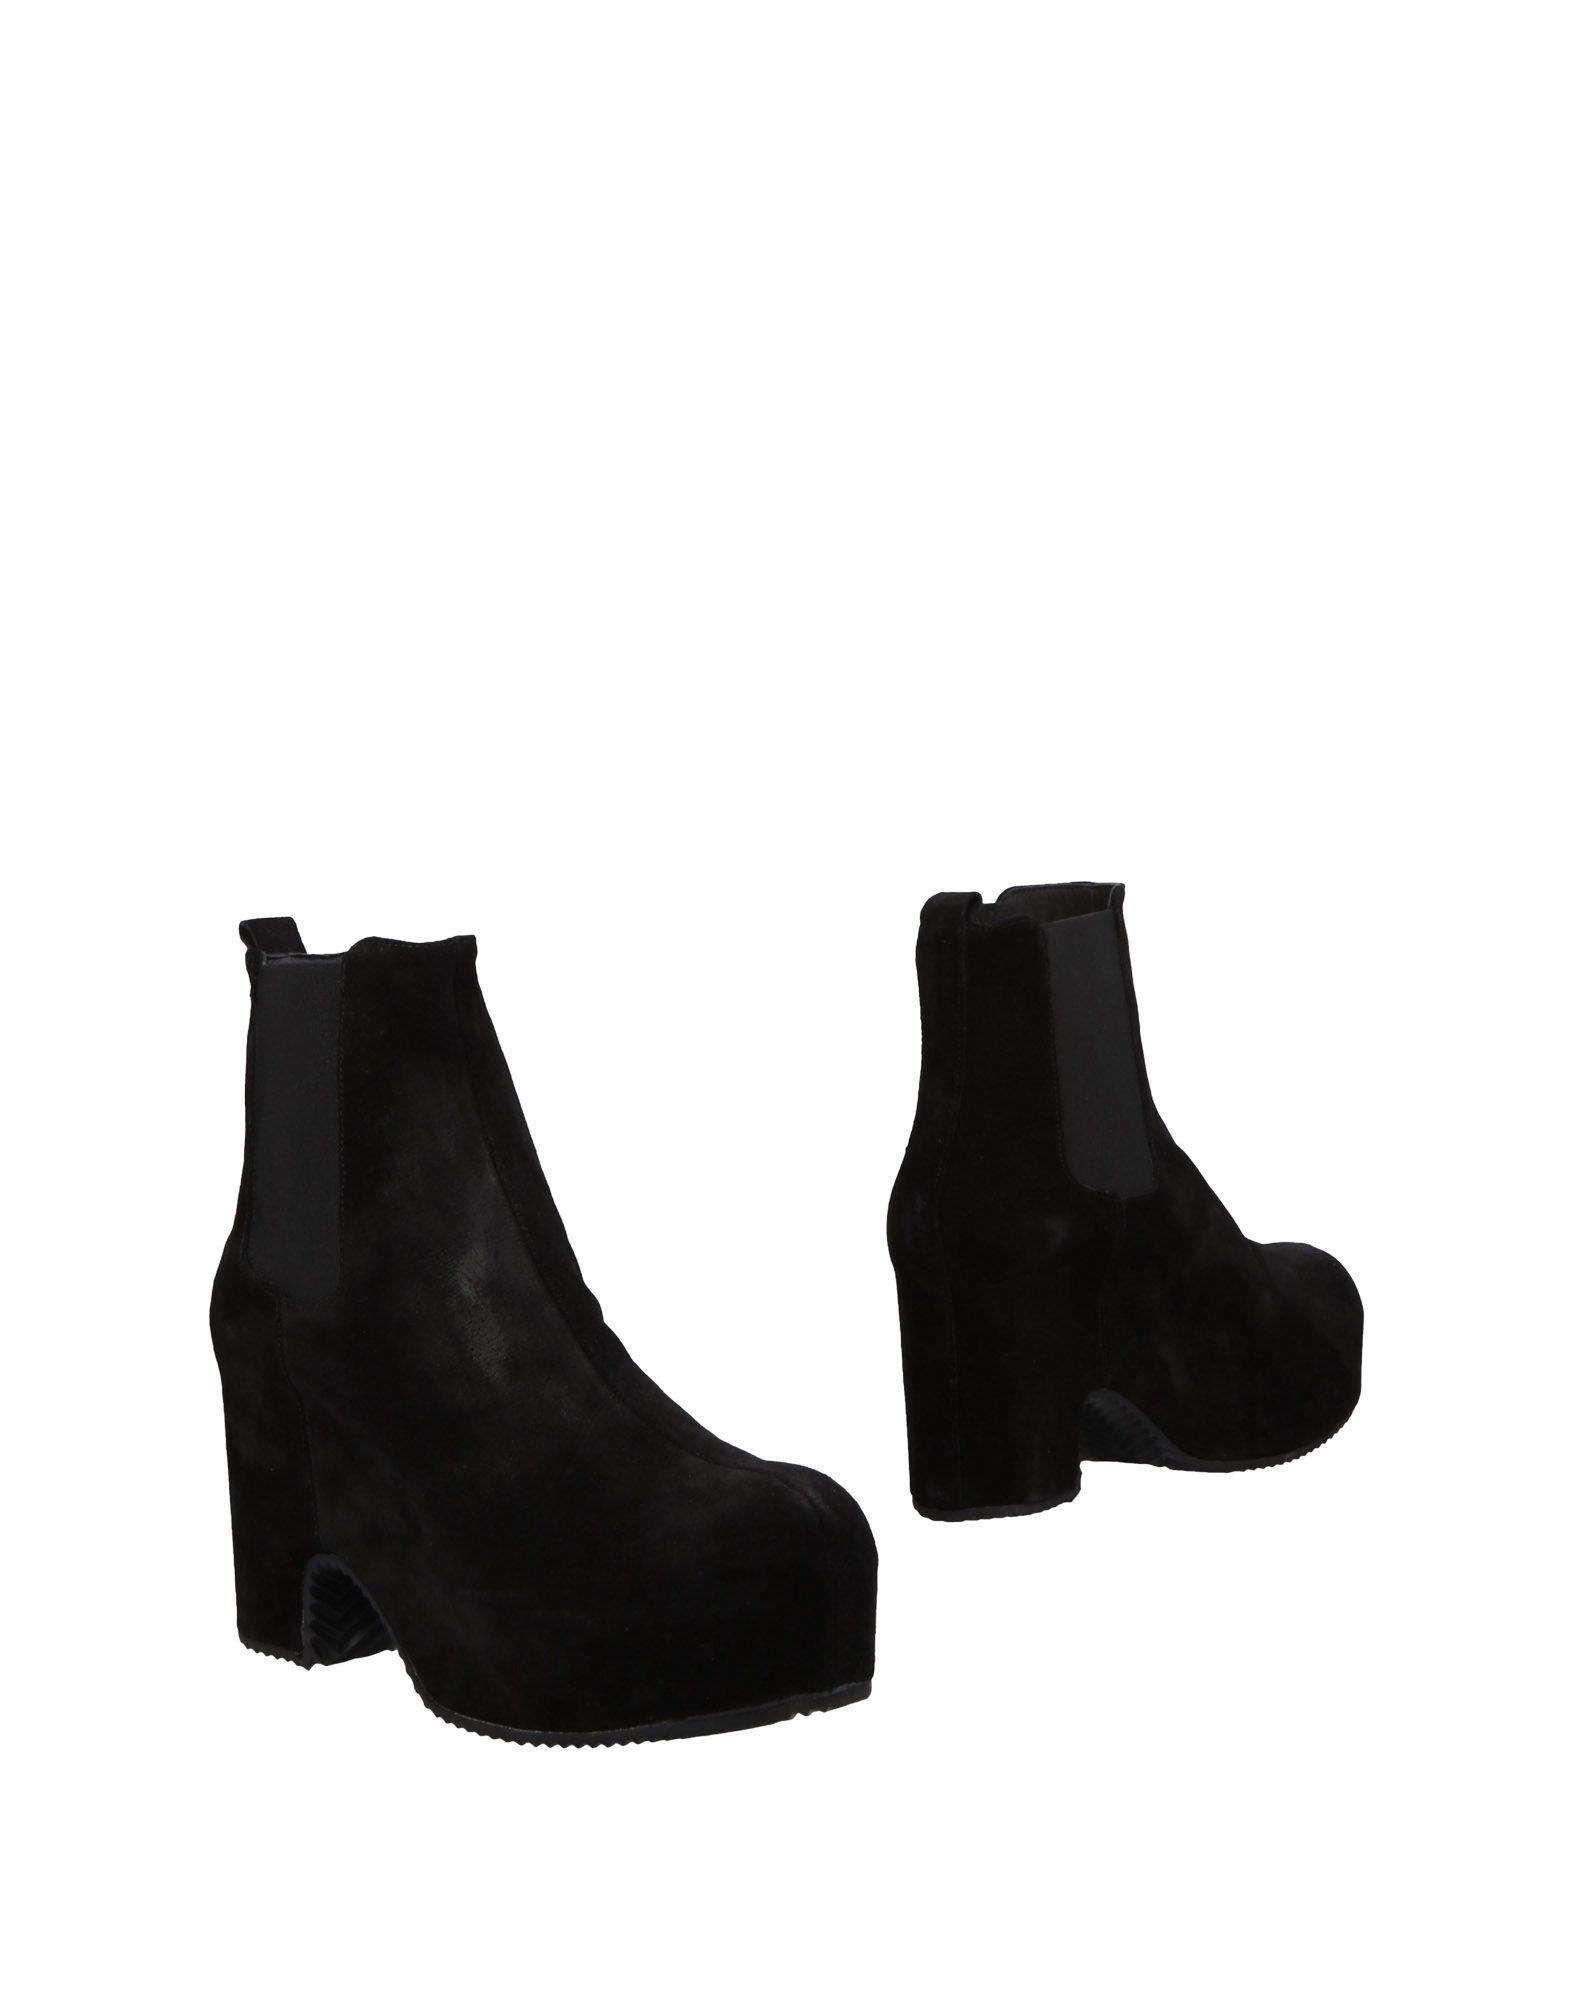 Viapantaleoni® Ankle Boot - Women on Viapantaleoni® Ankle Boots online on Women  Australia - 11482527NS 5f1a17